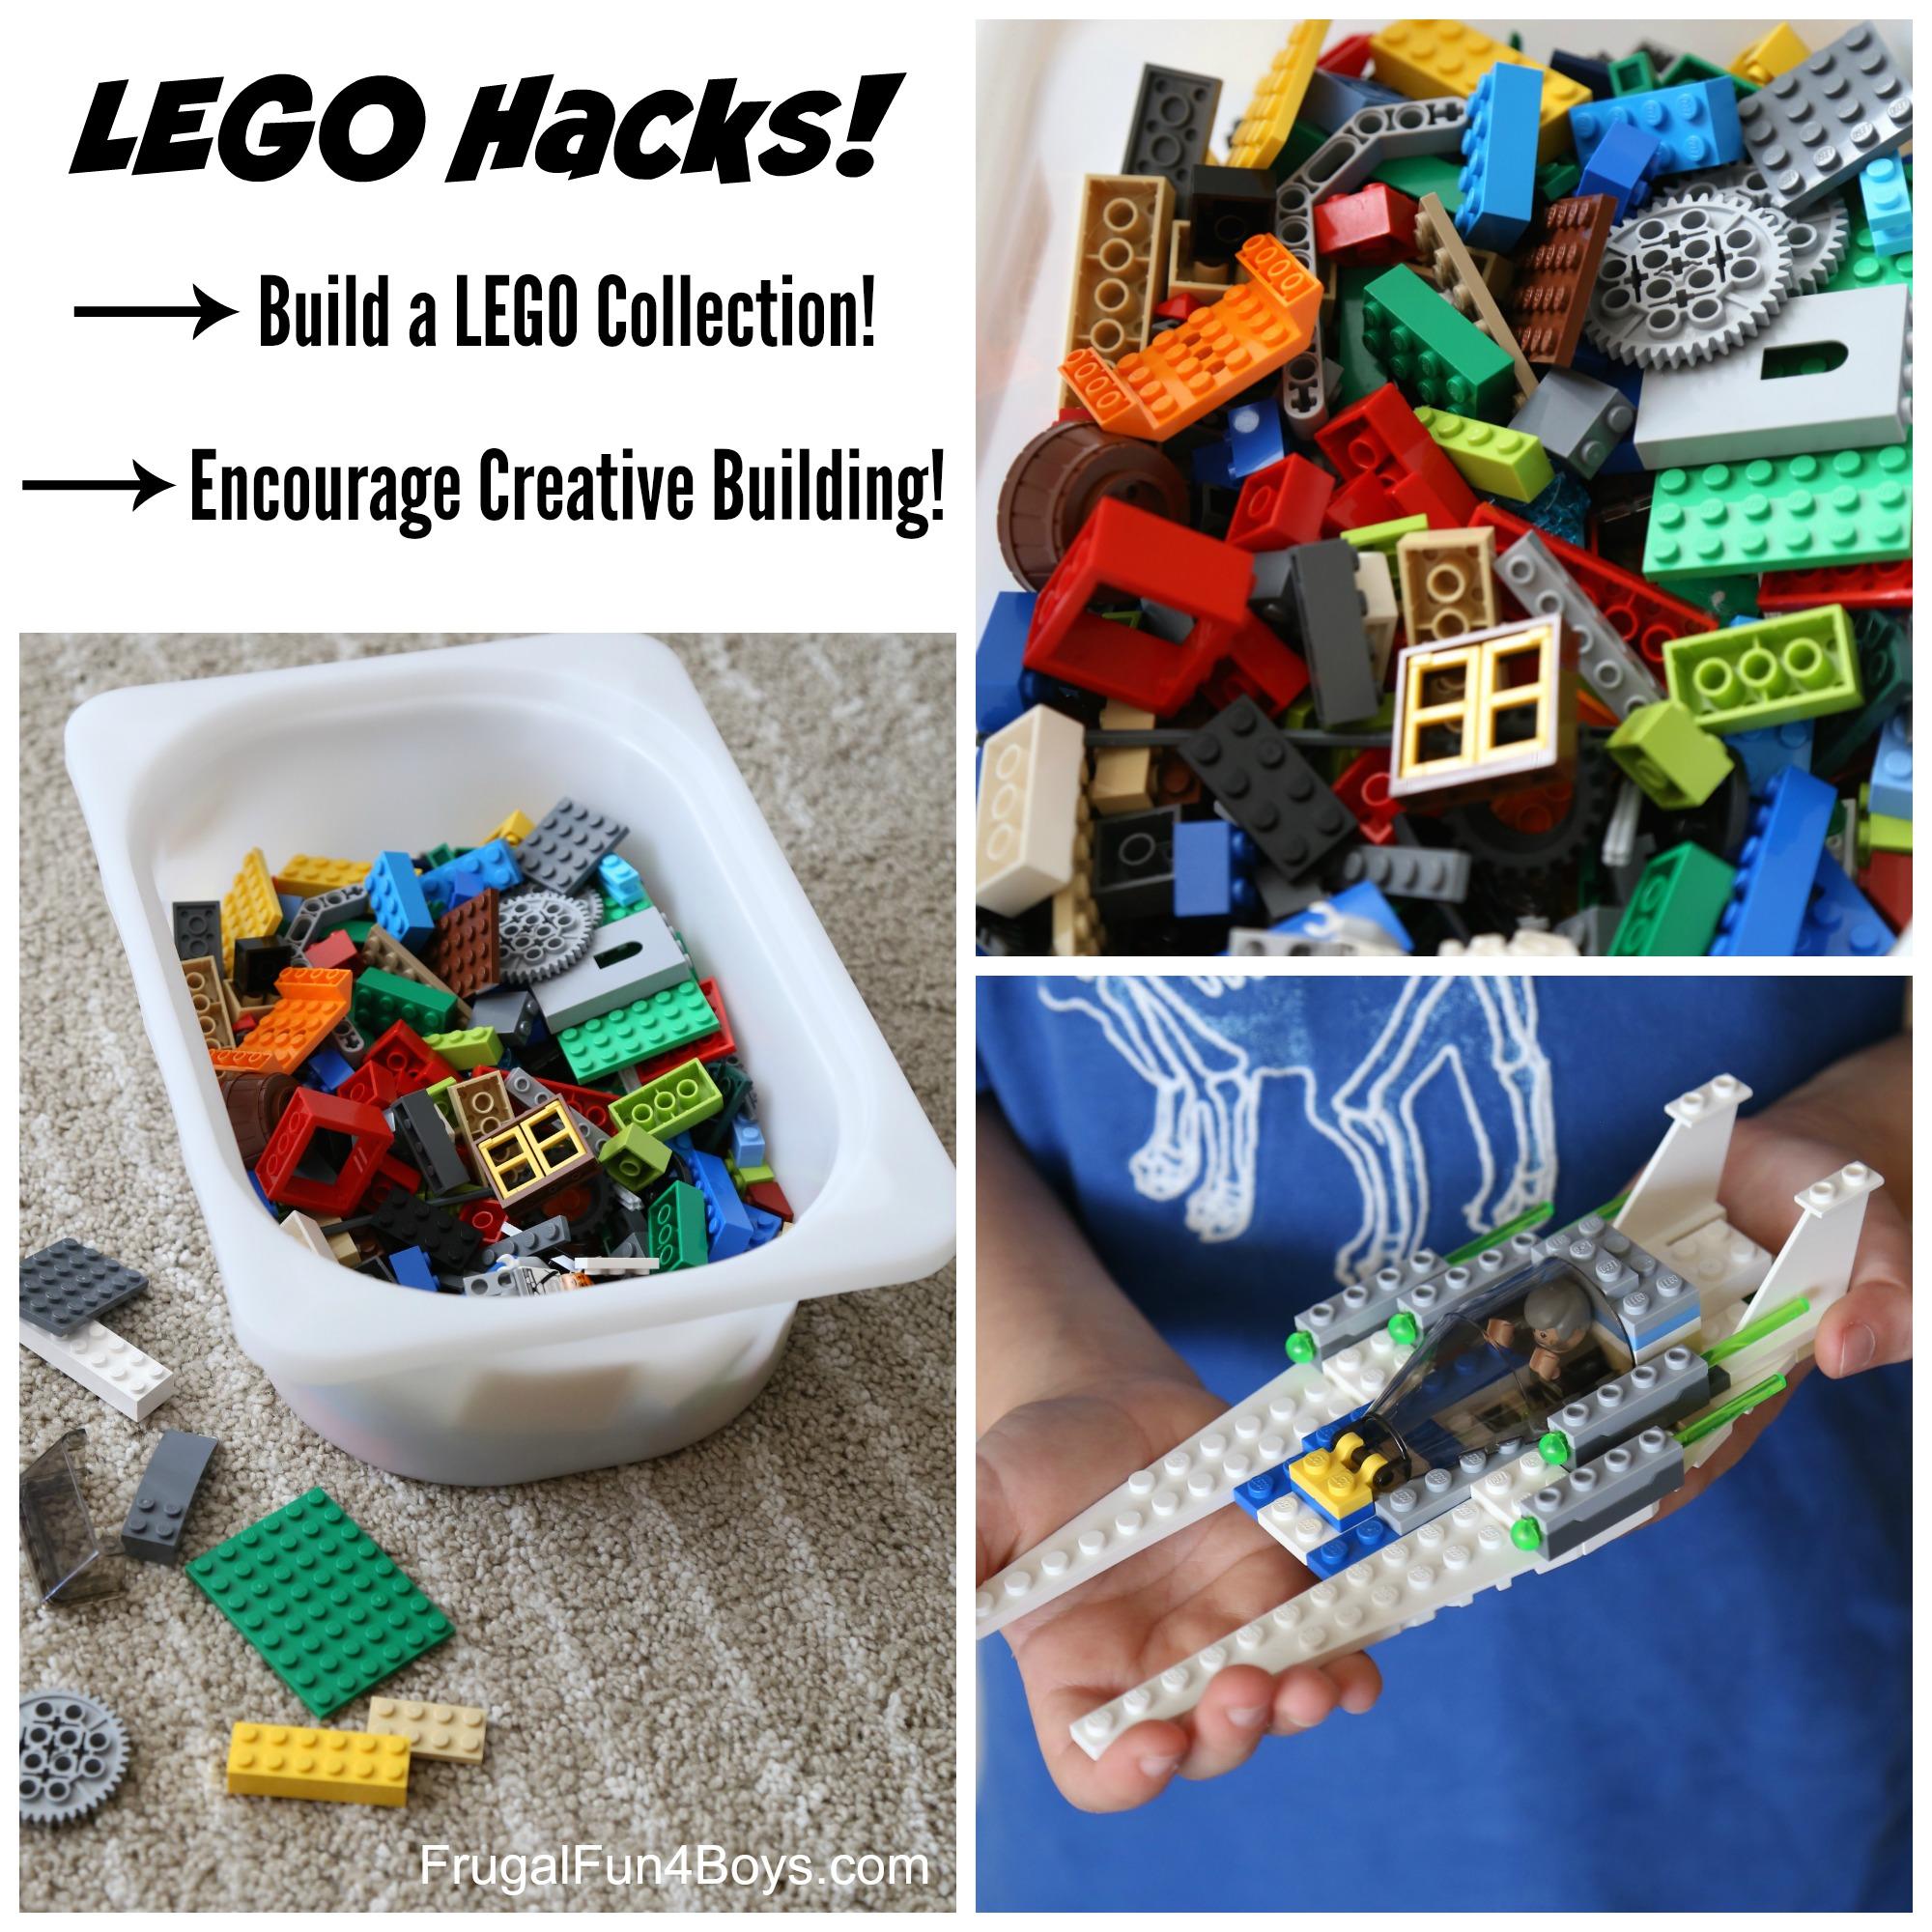 LEGO Hacks! Build a LEGO Collection and Encourage Creative Building!